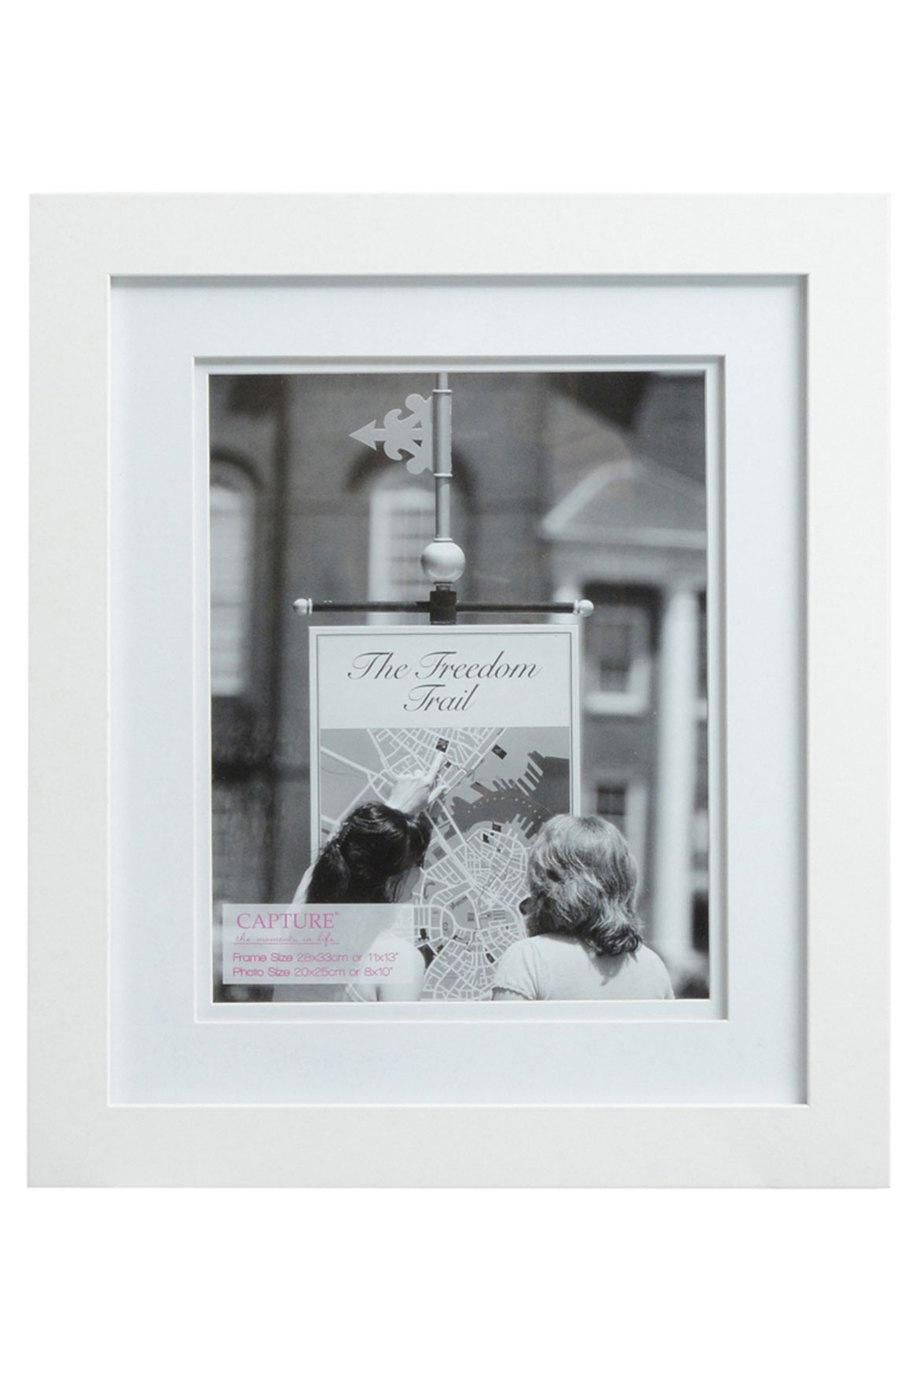 Capture | Venture 20x25cm White photo frame | Myer Online